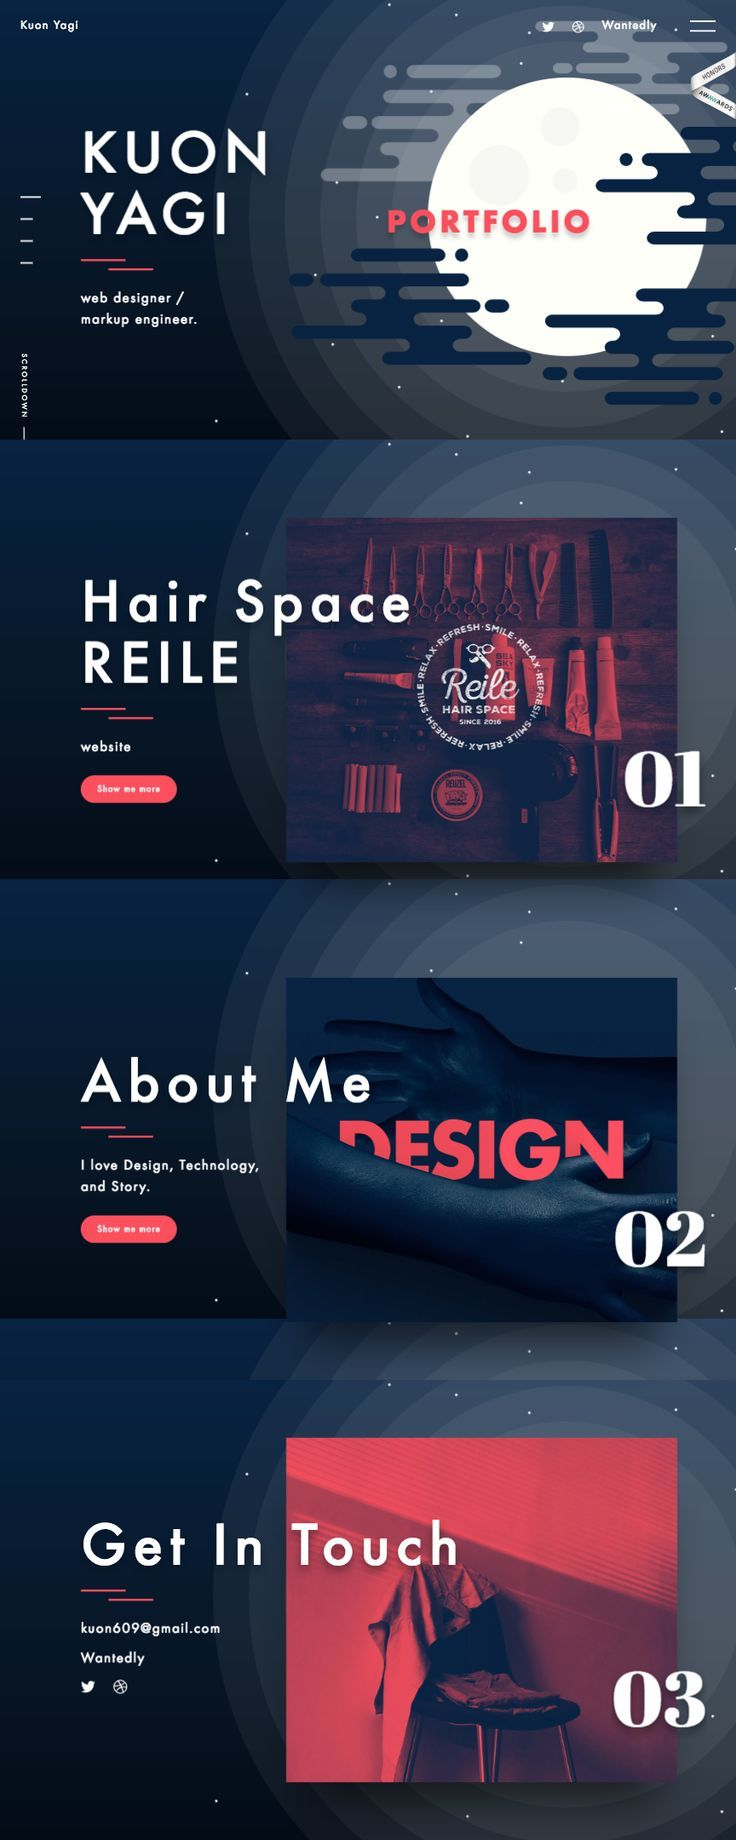 #webdesign #design – #Design #logo #Webdesign